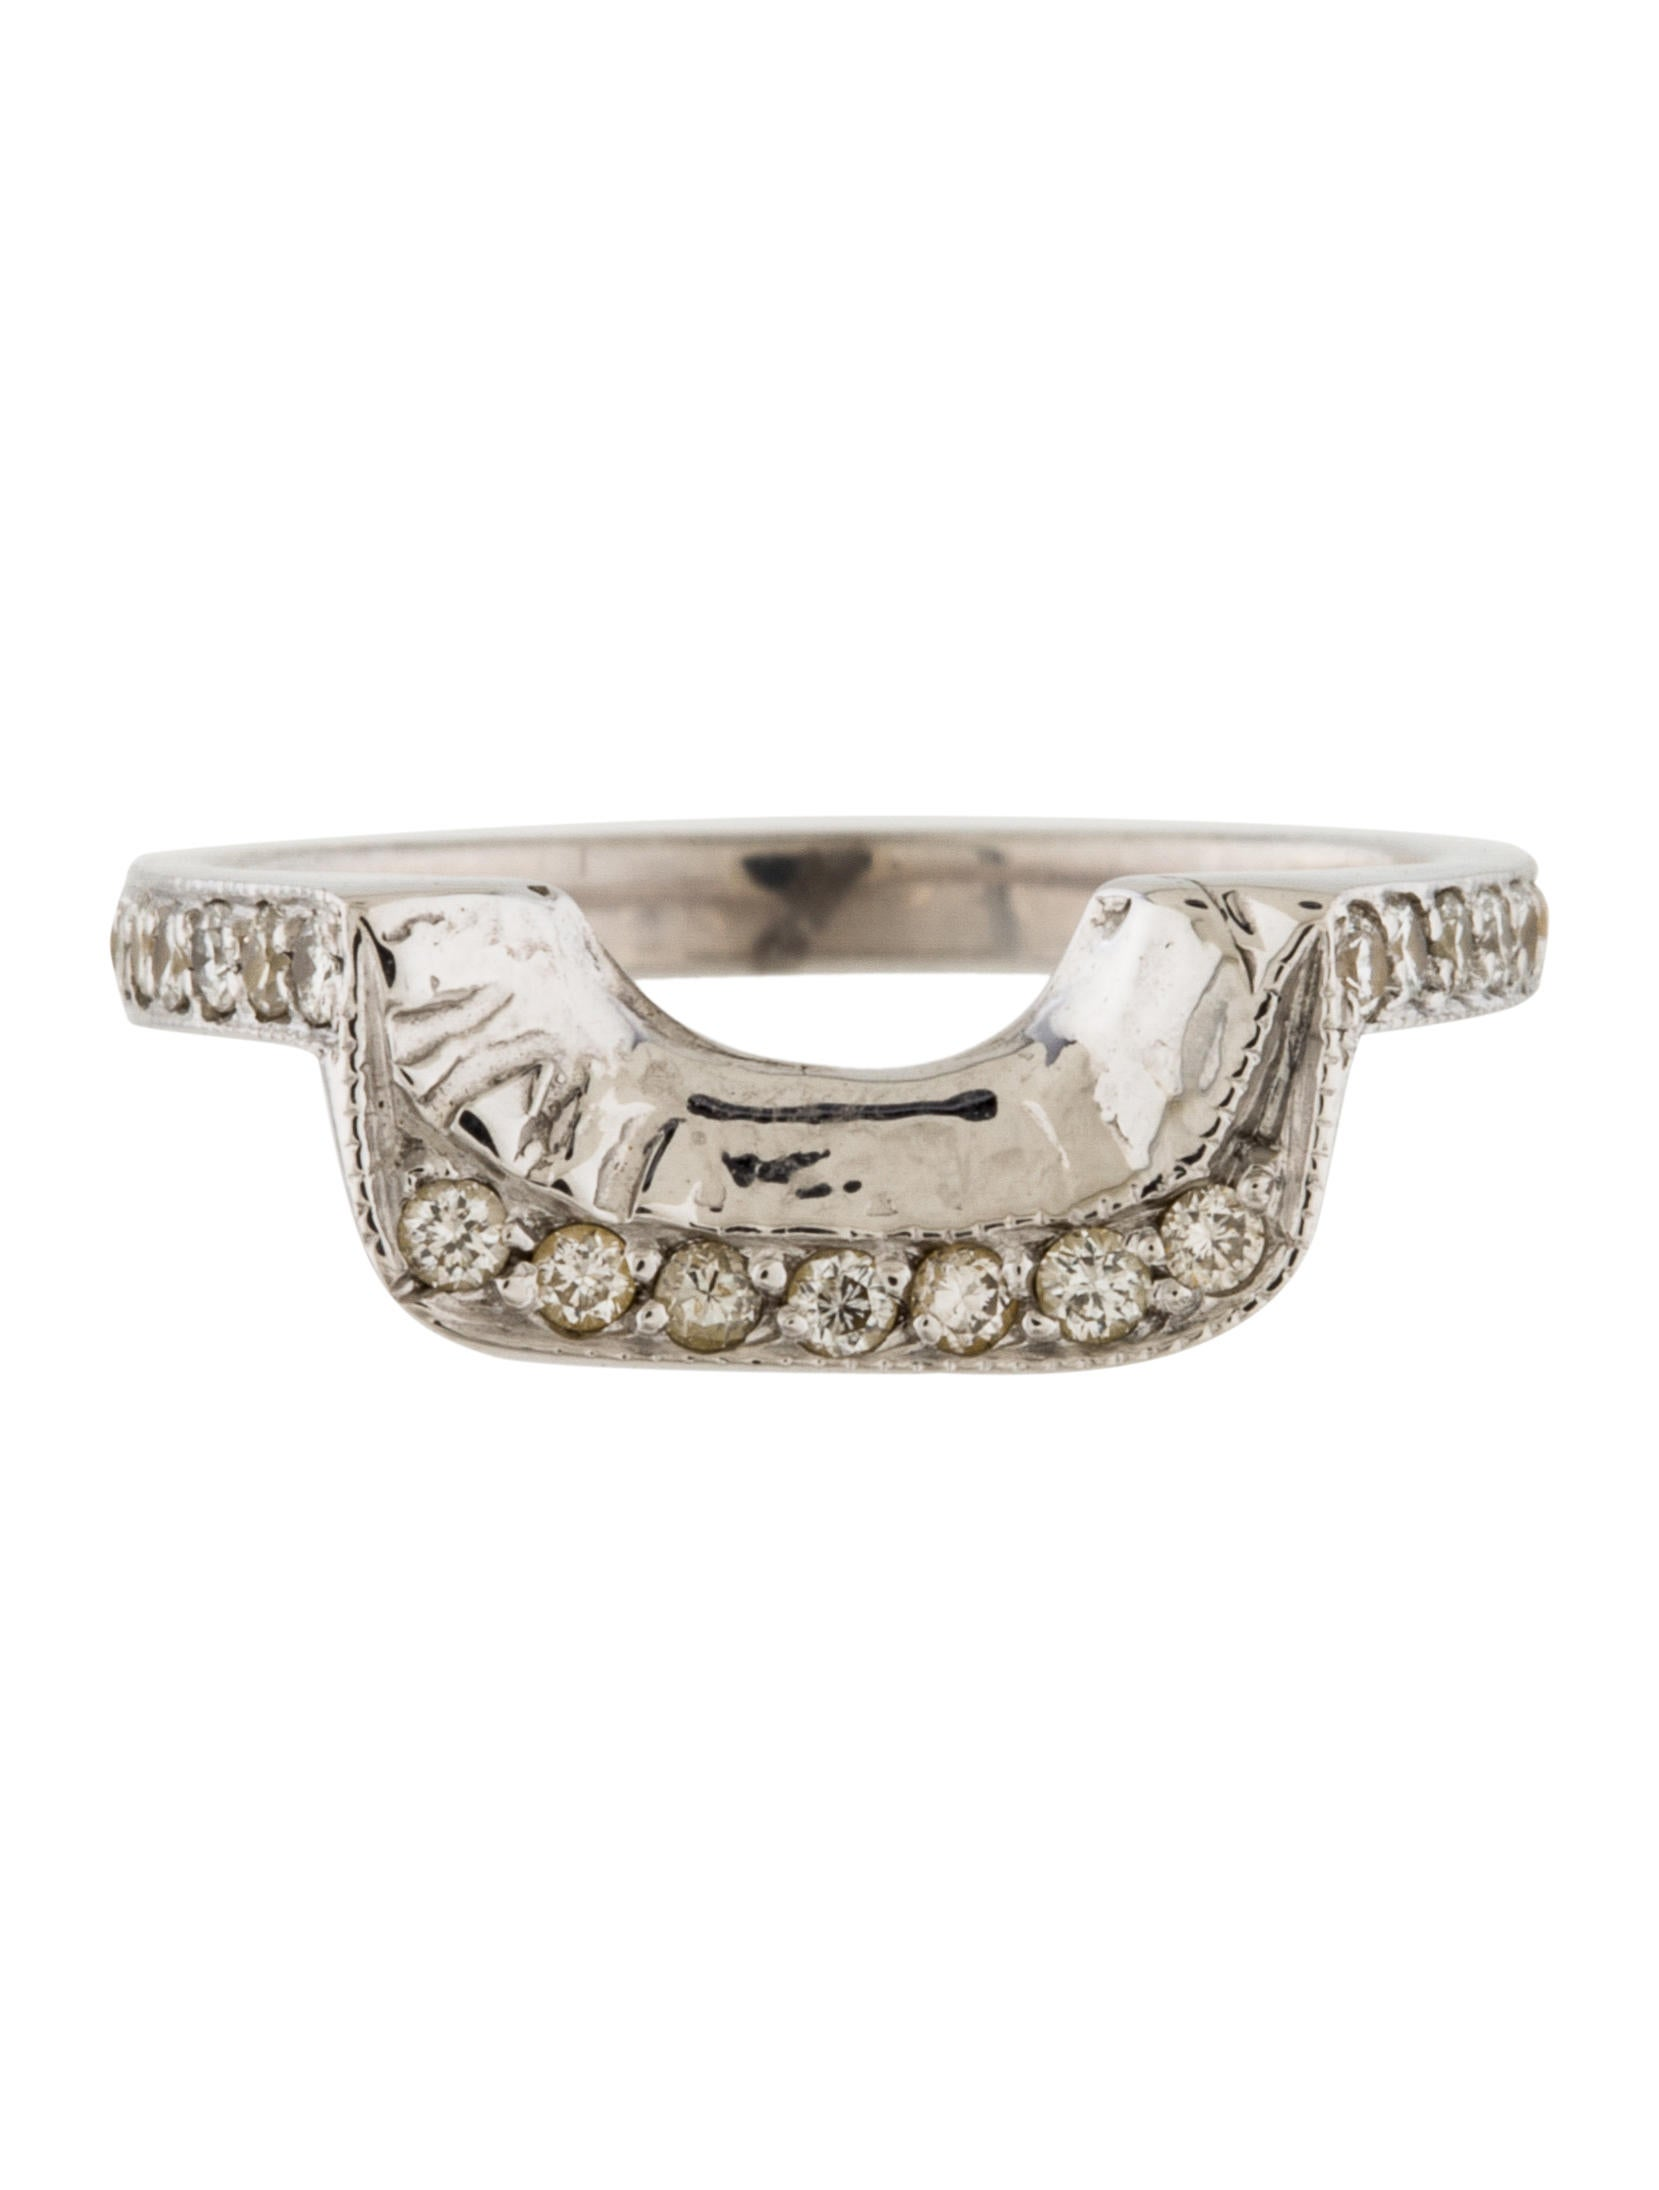 14k Diamond Contour Wedding Band  Rings  Rring38800. Teething Rings. Peach Bowl Rings. Iconic Rings. Spiritual Wedding Rings. Whimsical Engagement Rings. 24.99 Engagement Rings. Clear Quartz Wedding Rings. Tie Rings